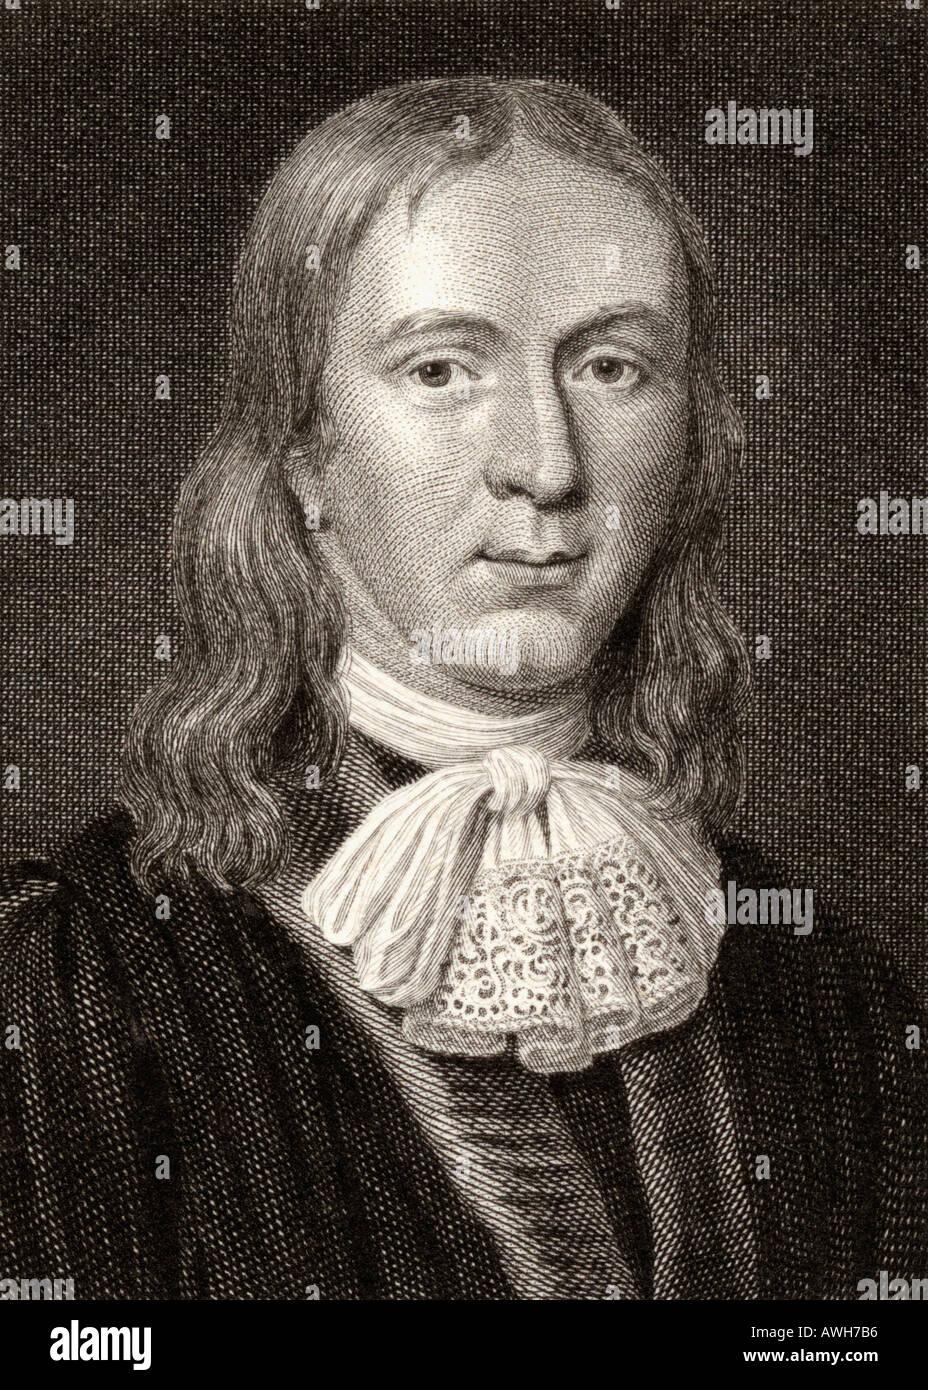 John Milton, 1608 - 1674.  English poet, polemicist, man of letters, and civil servant. - Stock Image